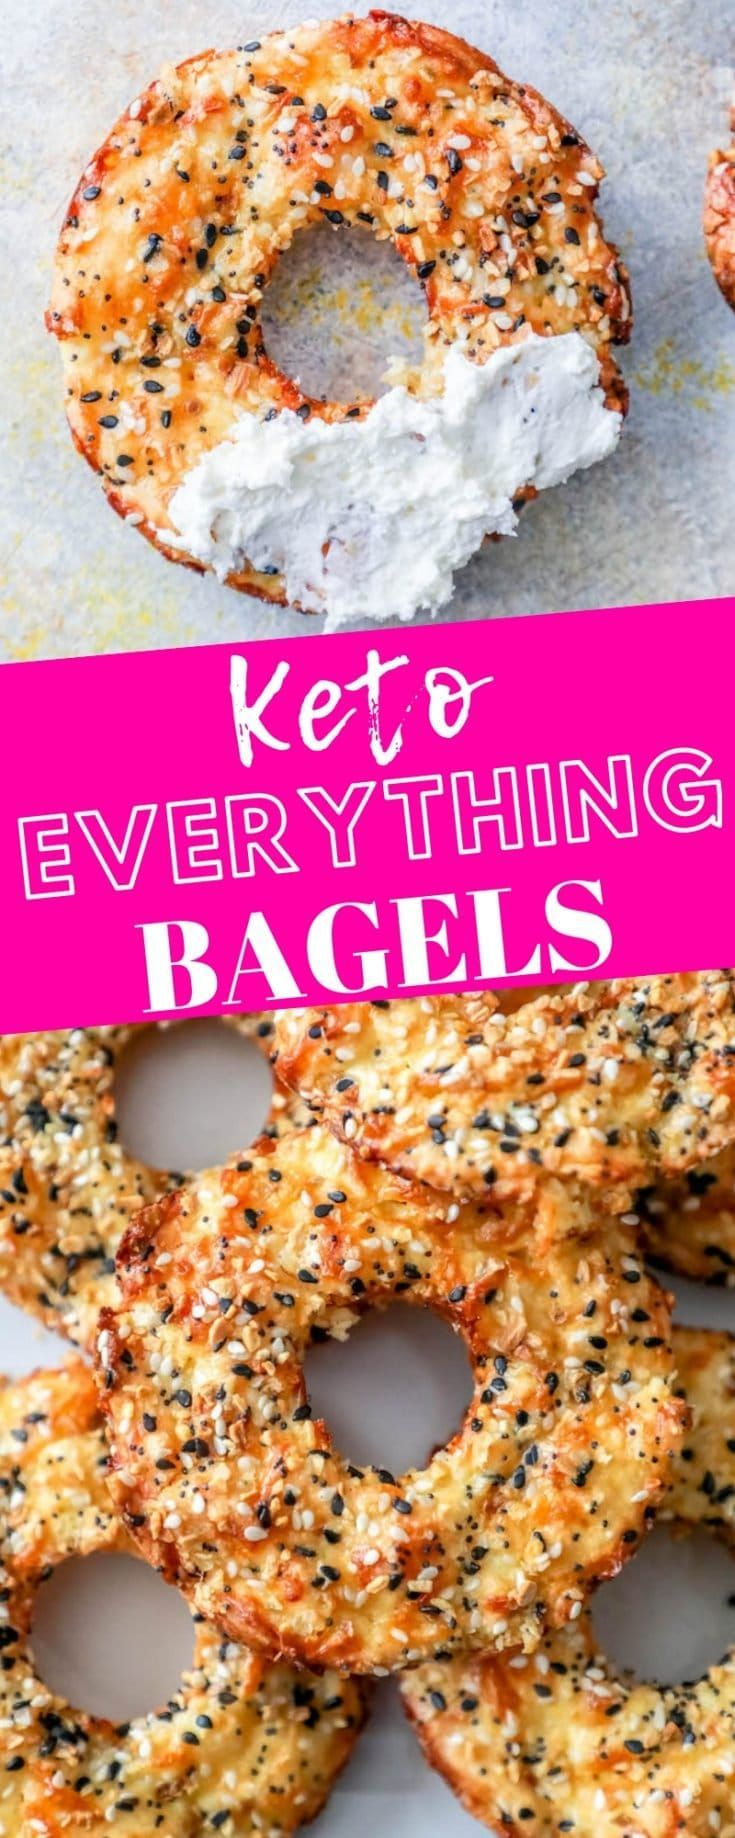 Easy Keto Everything Bagels Recipe ⋆ Sweet Cs Designs